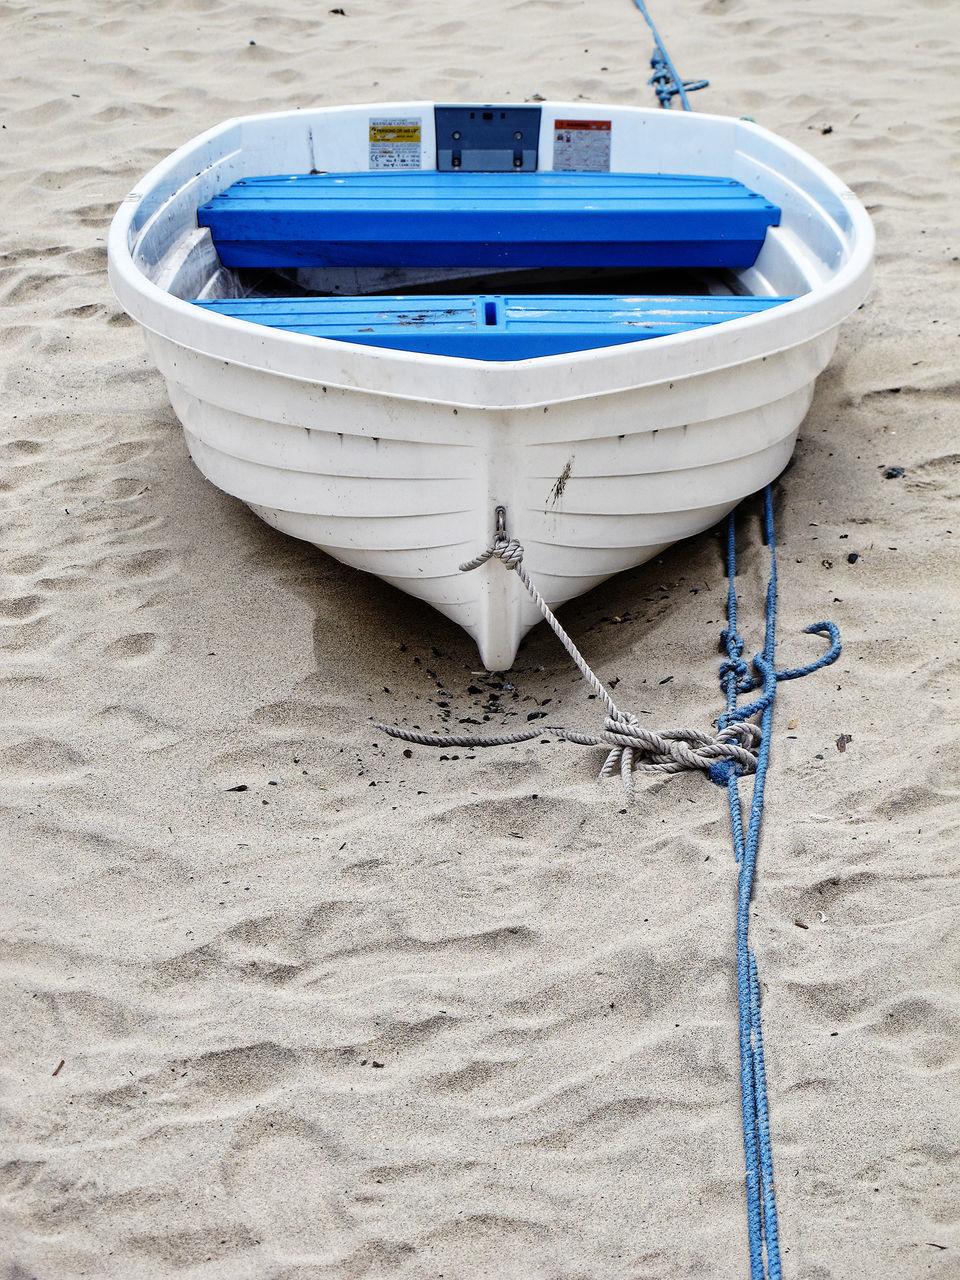 White Rowboat Moored At Beach